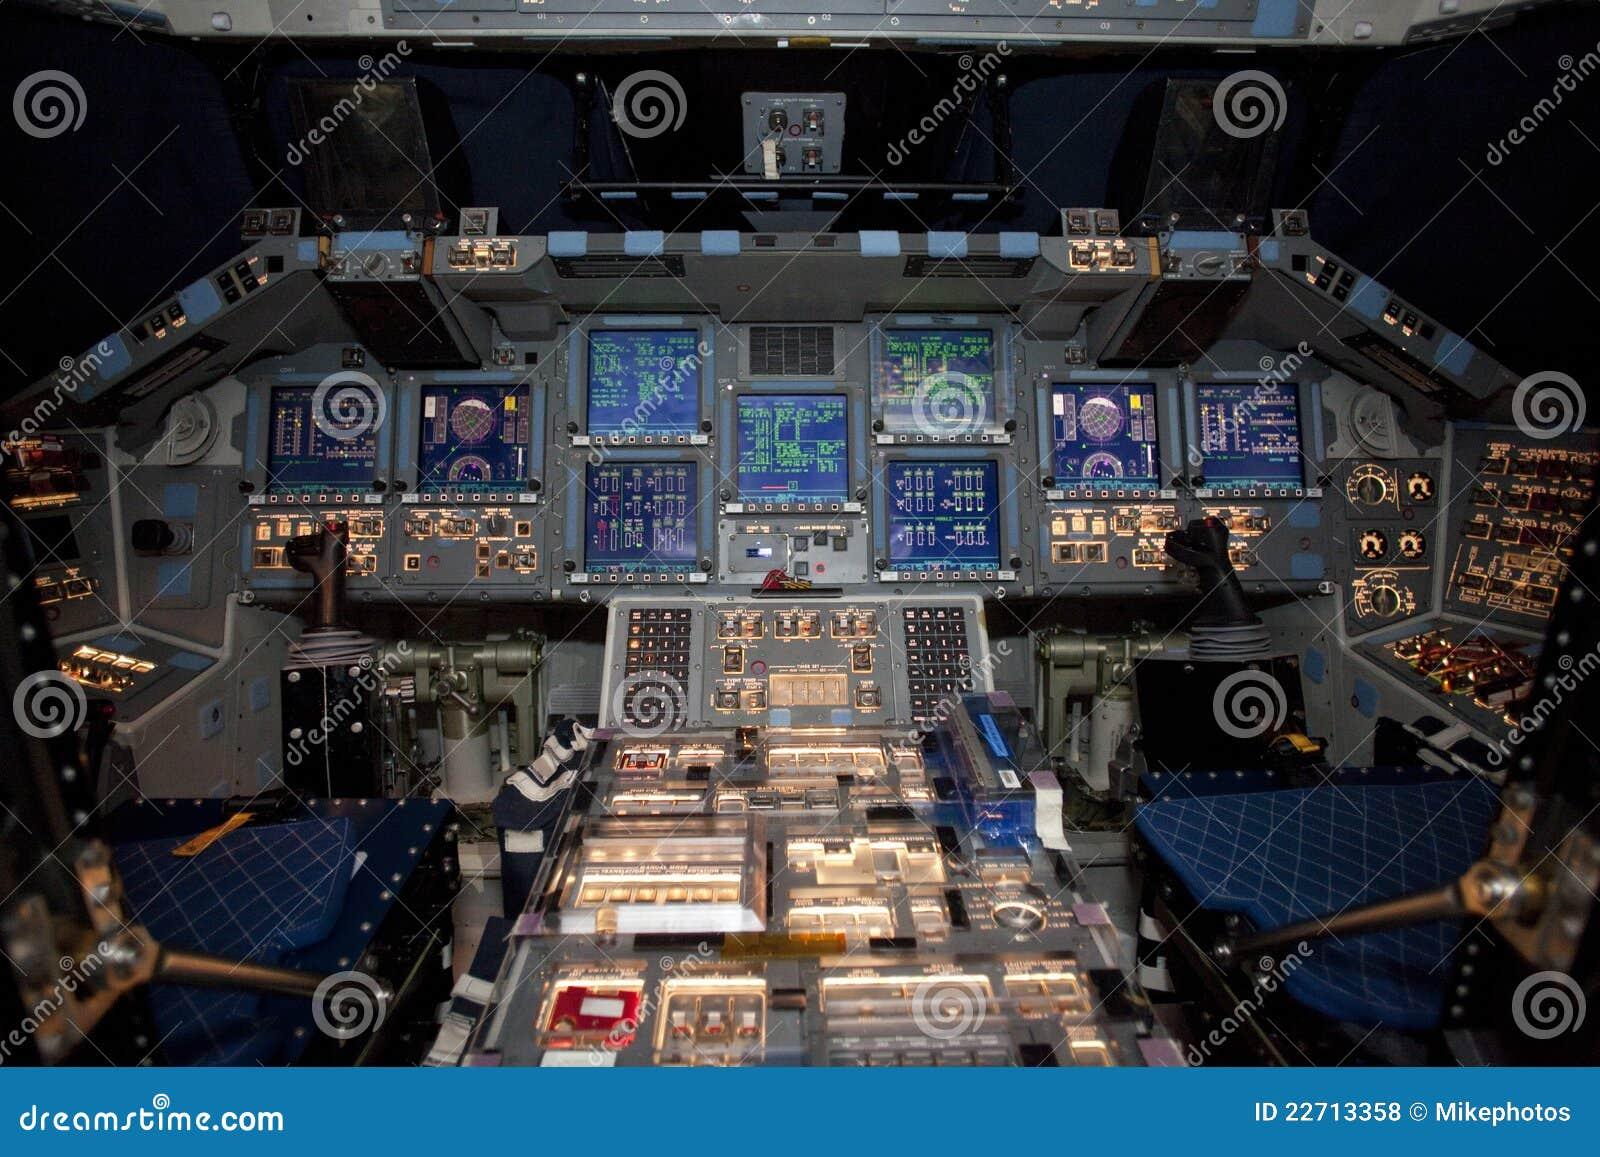 Space Shuttle Atlantis Editorial Stock Photo - Image: 22713358